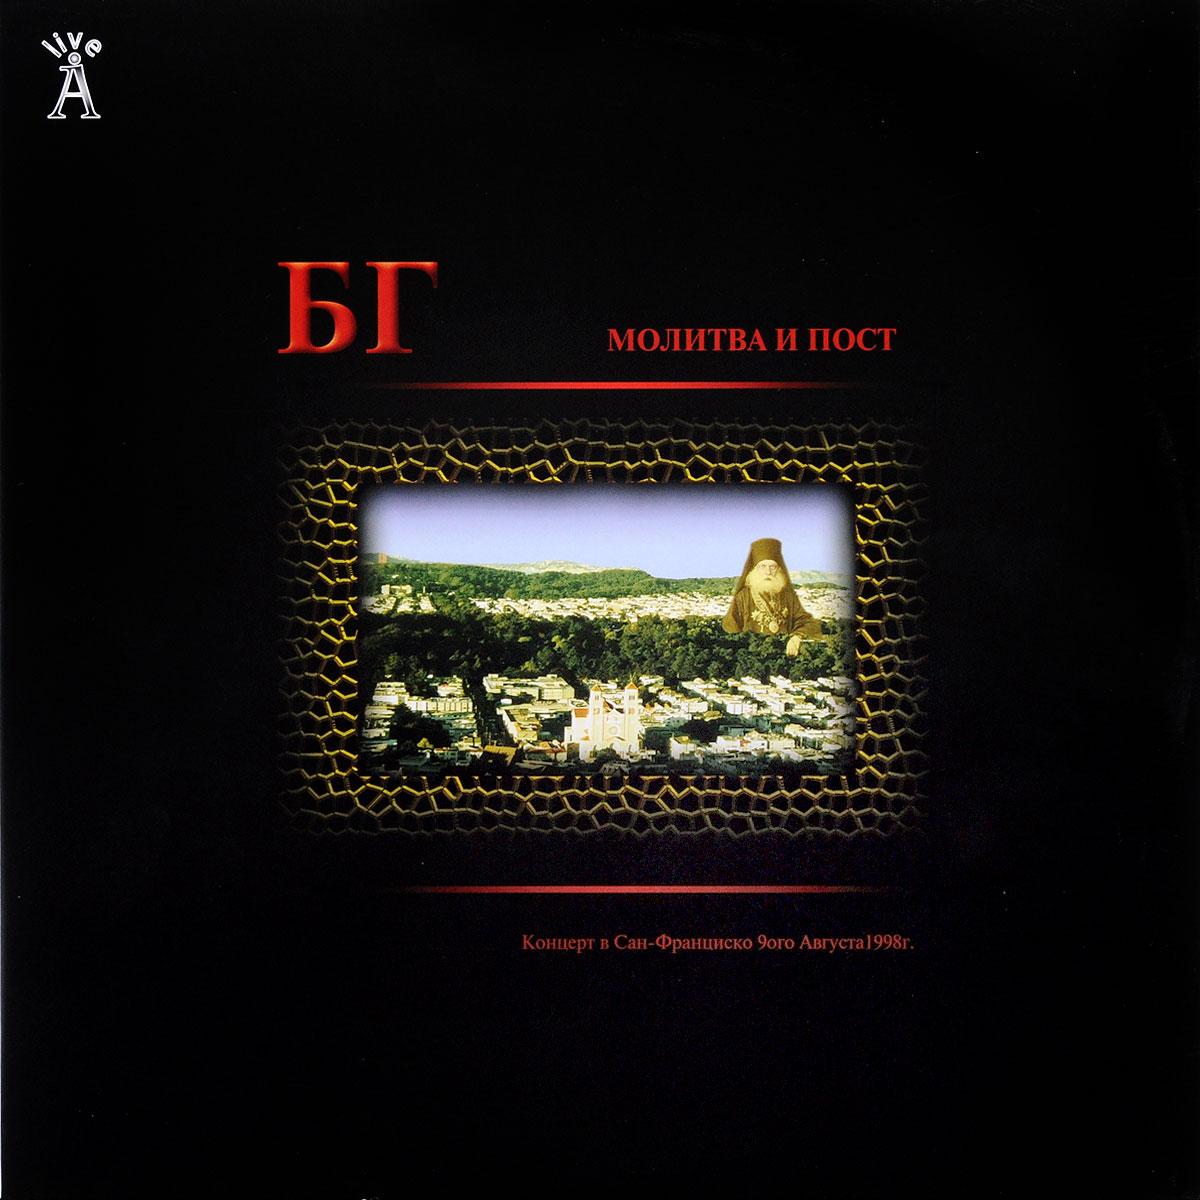 Борис Гребенщиков БГ. Молитва и пост (2 LP) ennio morricone jubilee lp